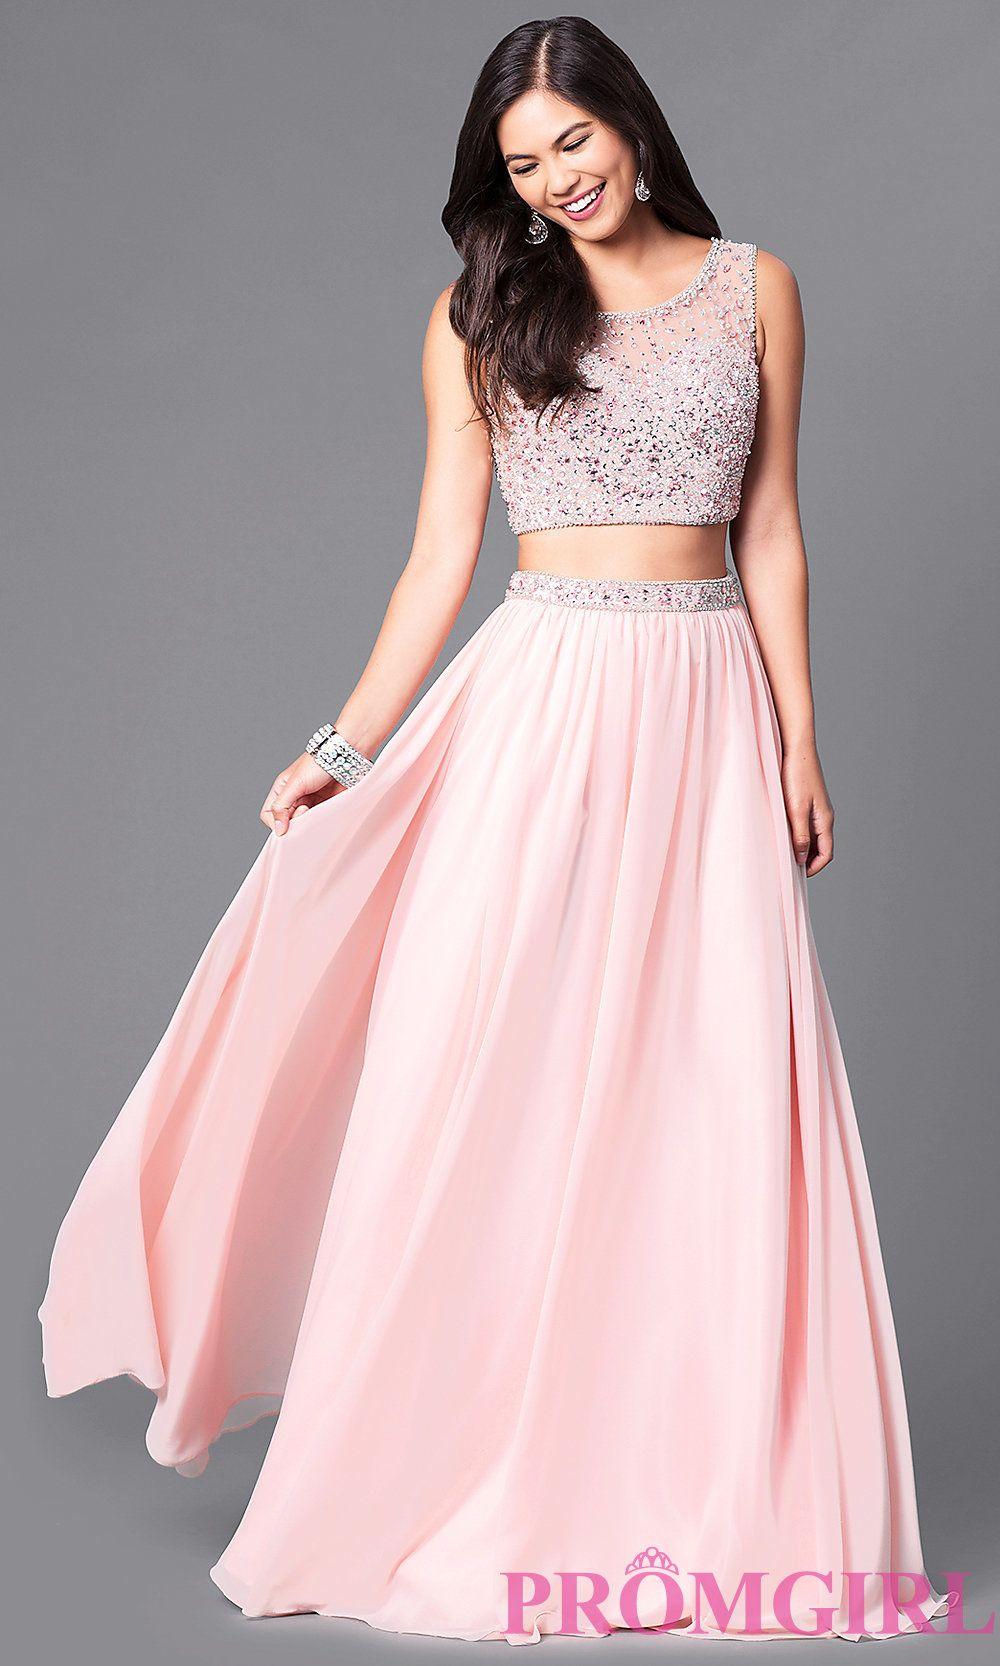 Pin von Jess auf Prom dresses | Pinterest